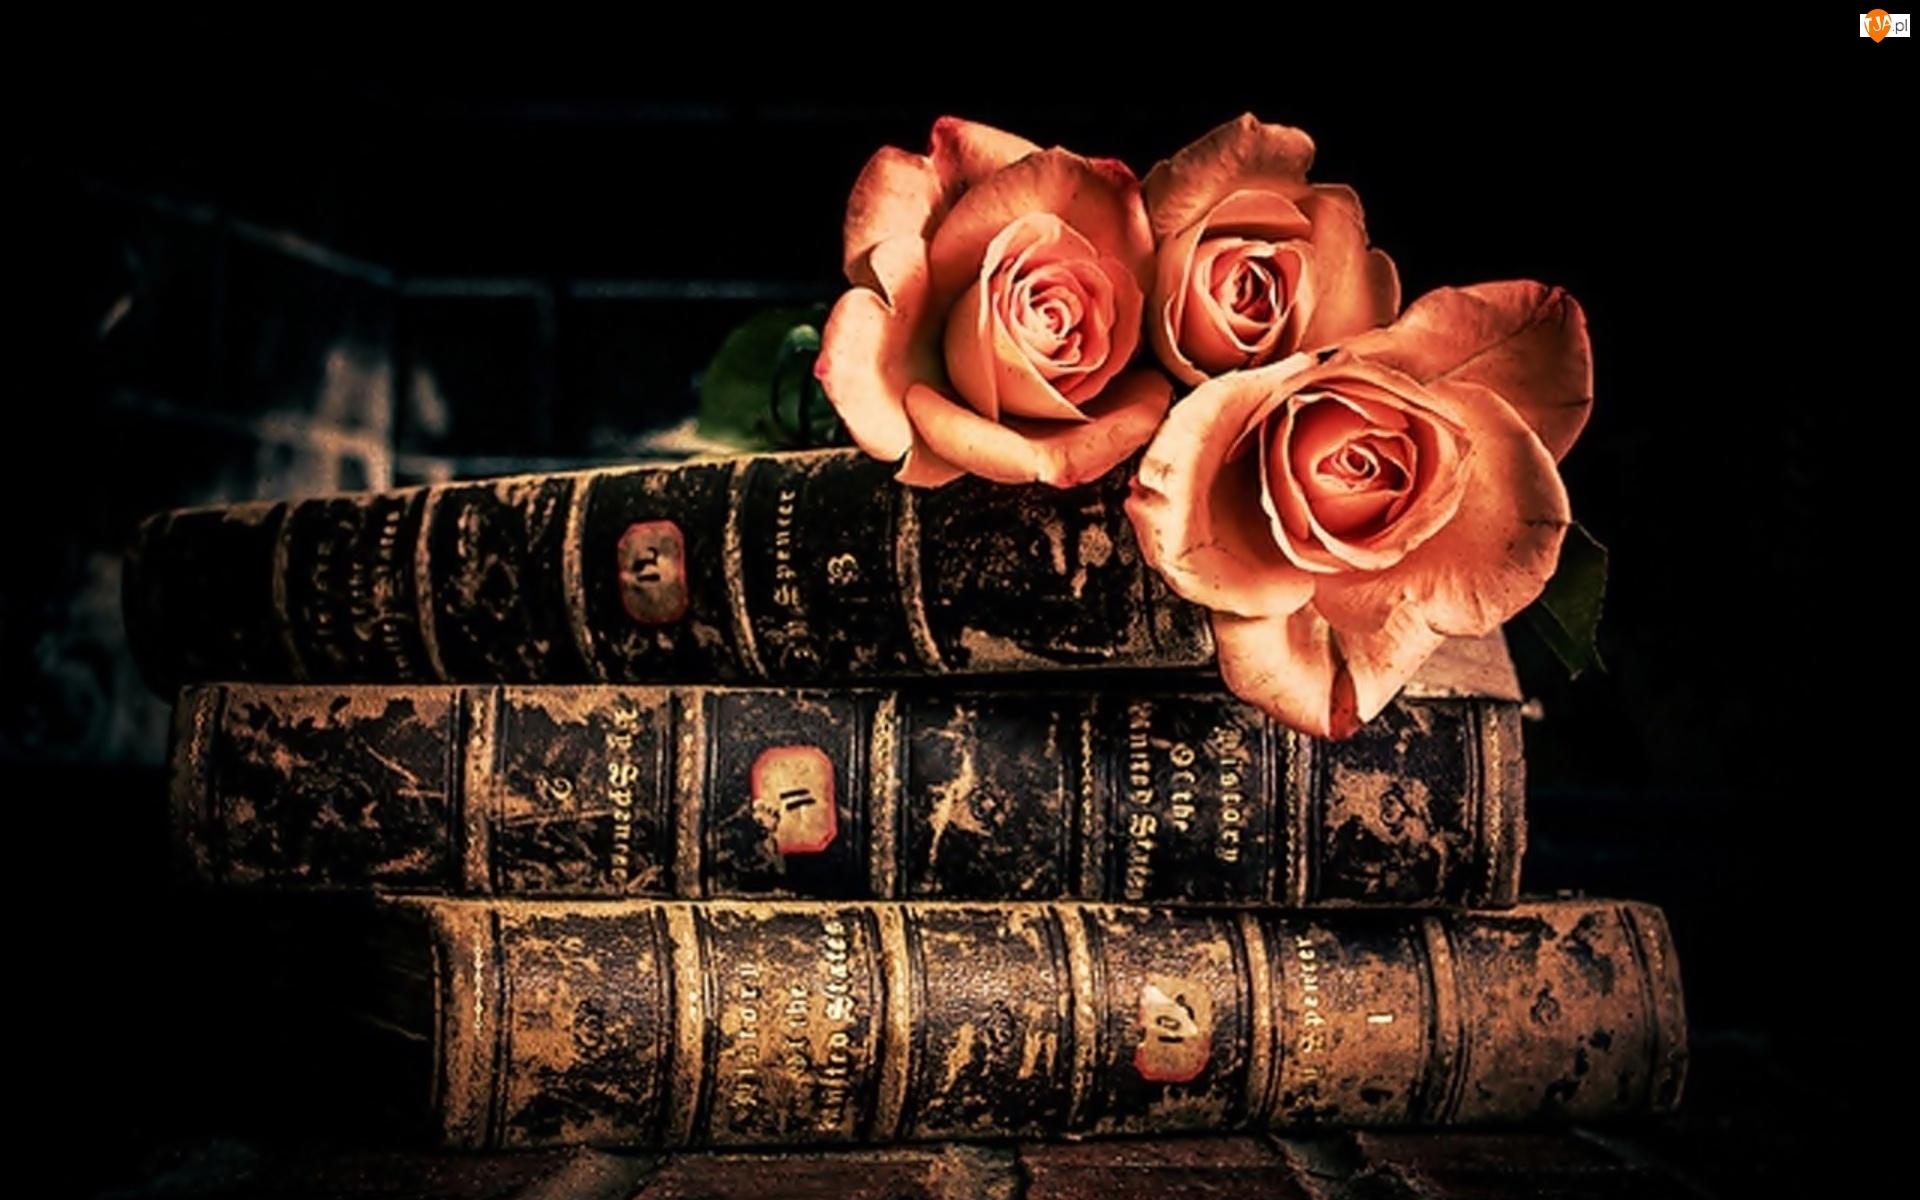 Kompozycja, Stare, Bukiet, Księgi, Róż